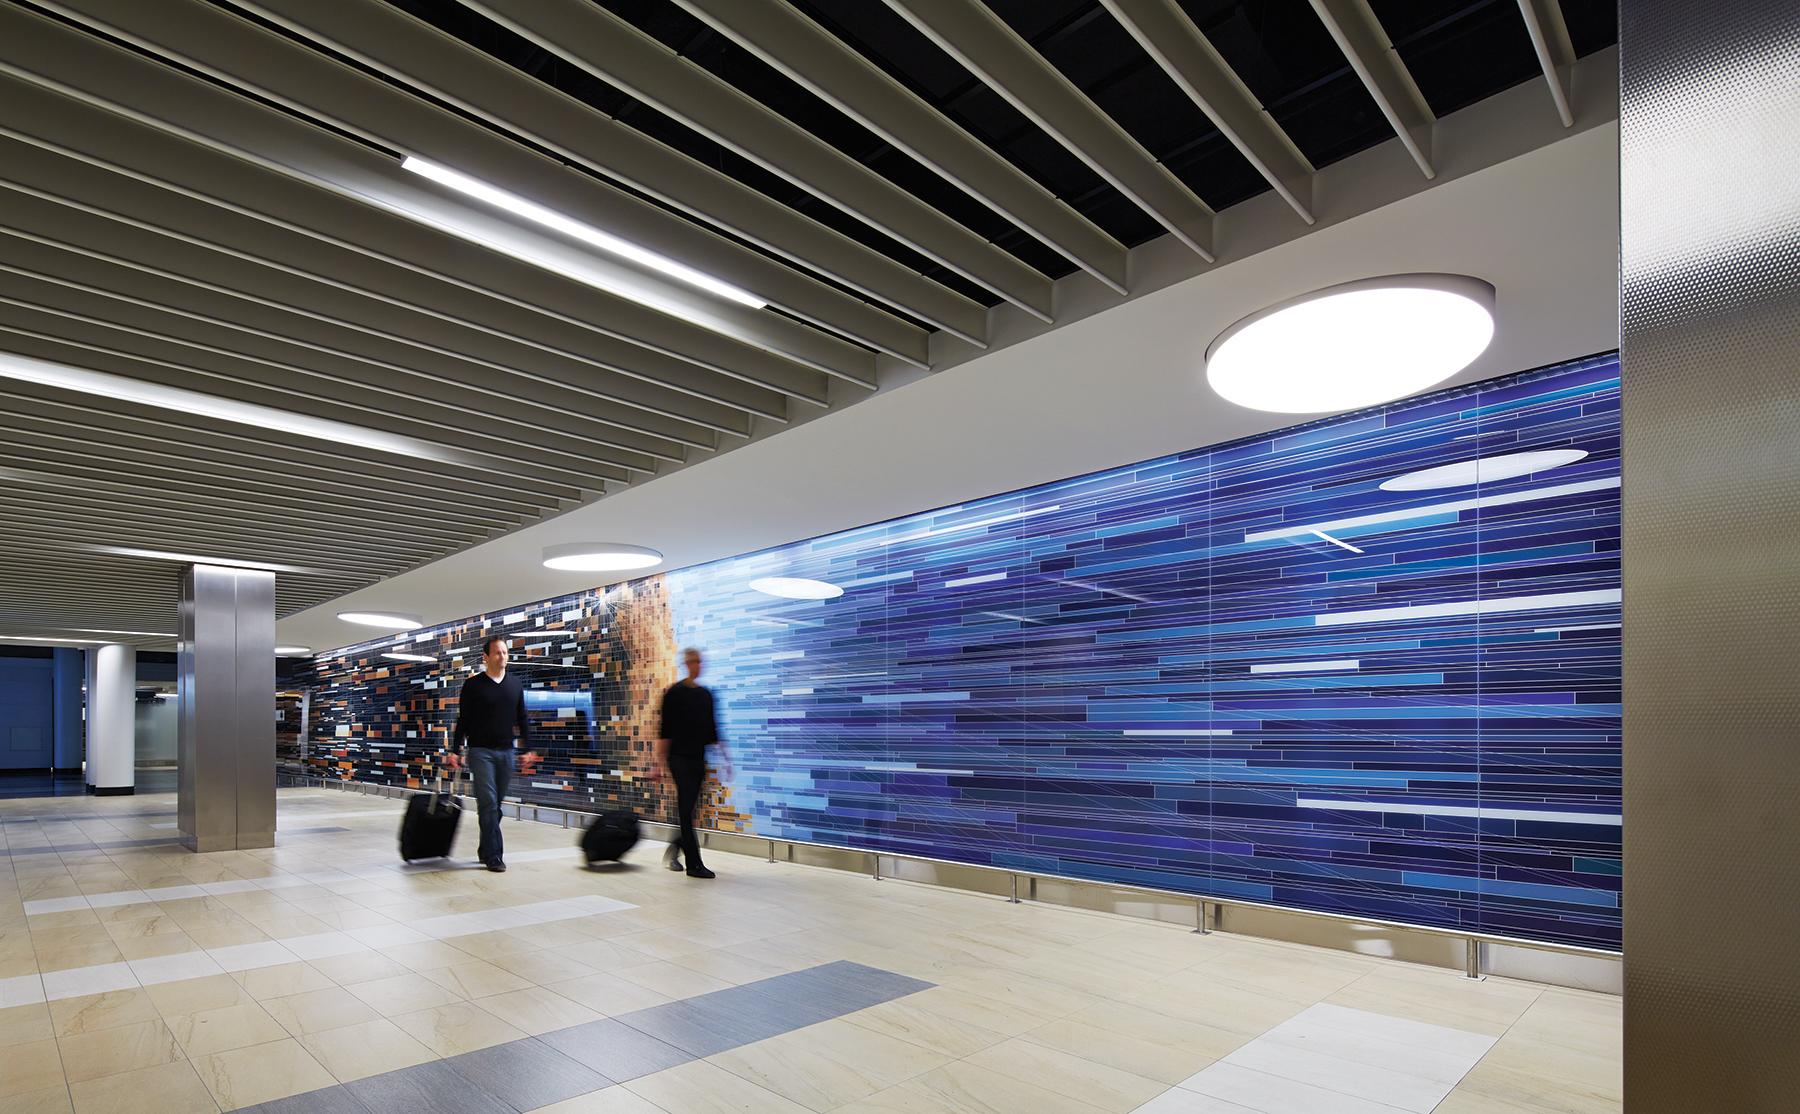 01-OHare-Terminal-5-Concessions-Chicago-